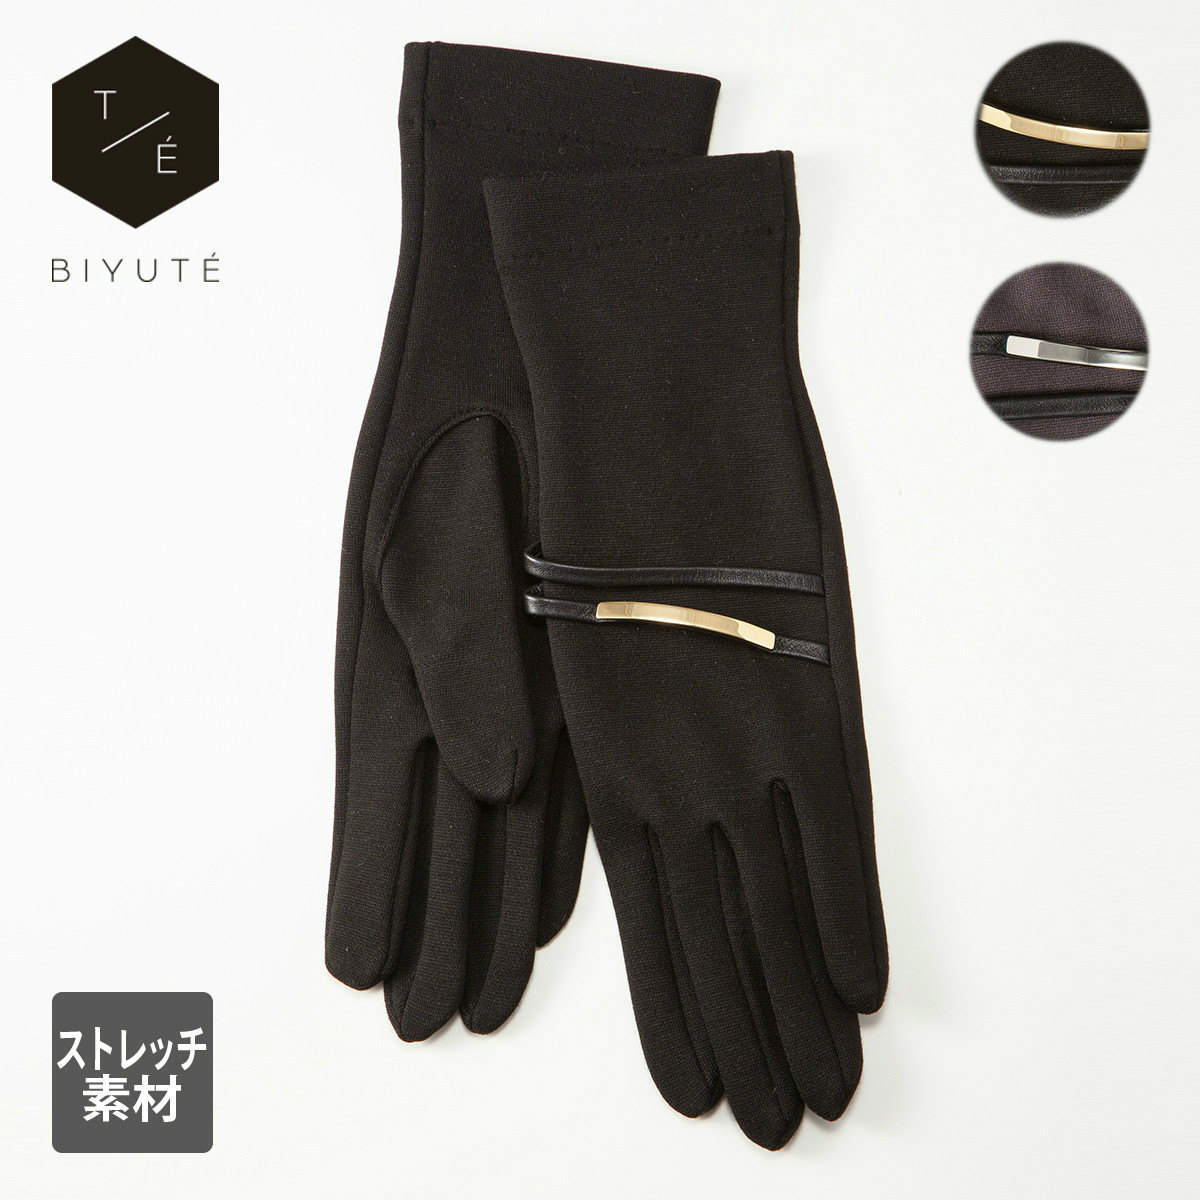 BIYUTE レディース ジャージ手袋 甲側メタルアクセサリー付き ちょっと長め丈 ストレッチ素材 Mサイズ 全2色